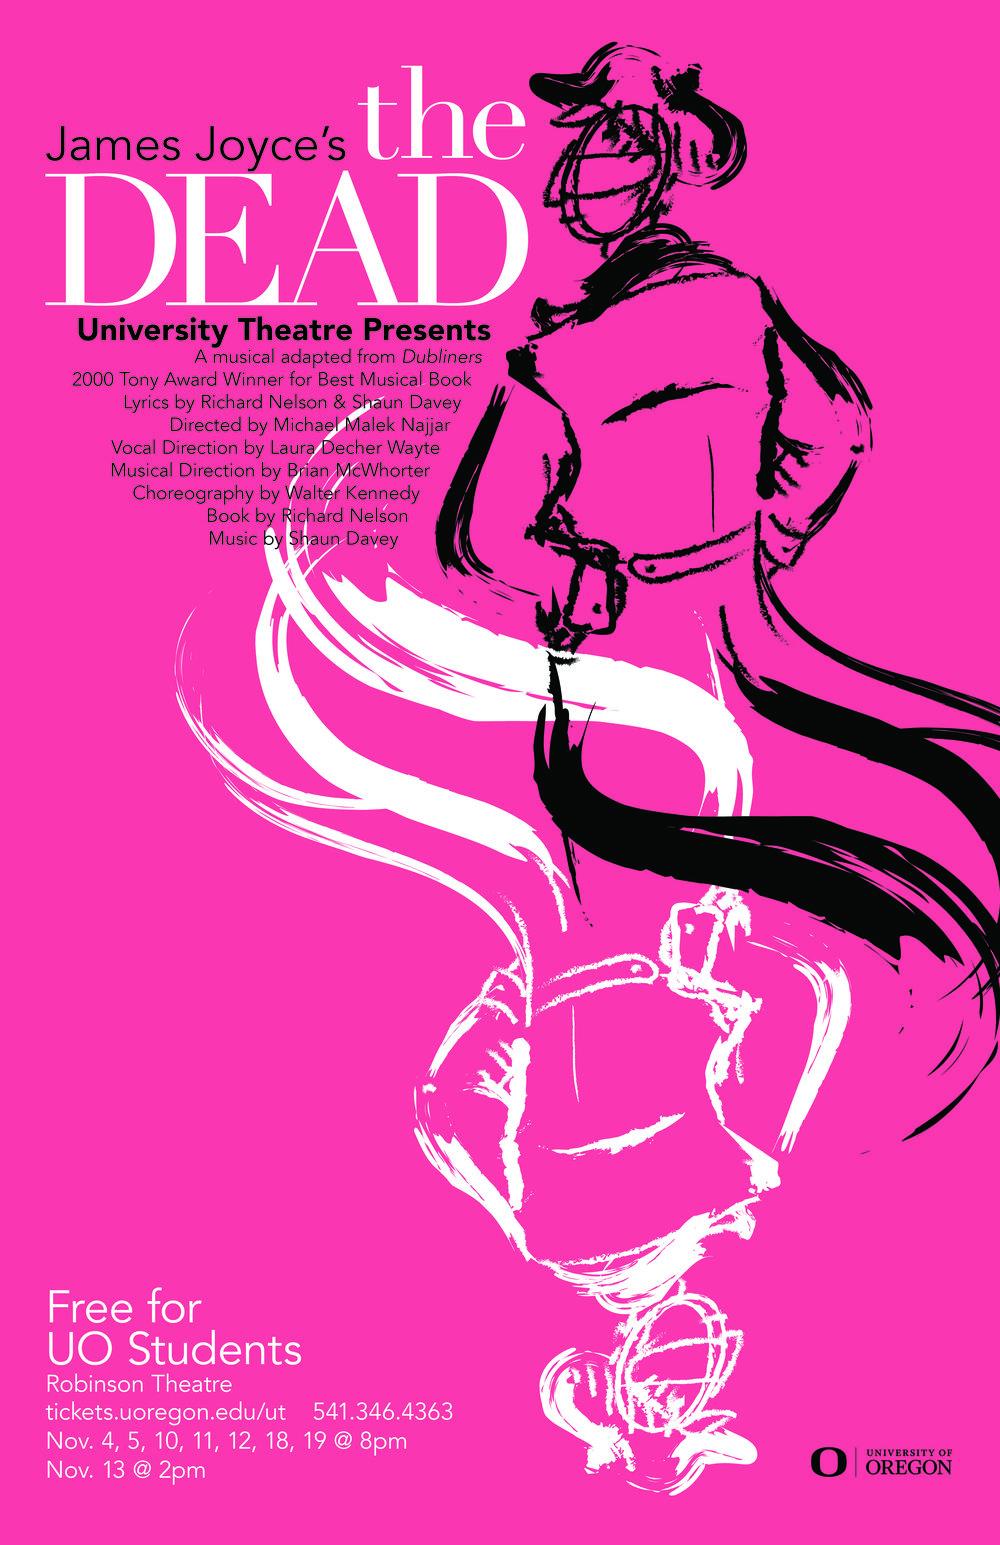 The Dead Poster (11x17) 3.jpg